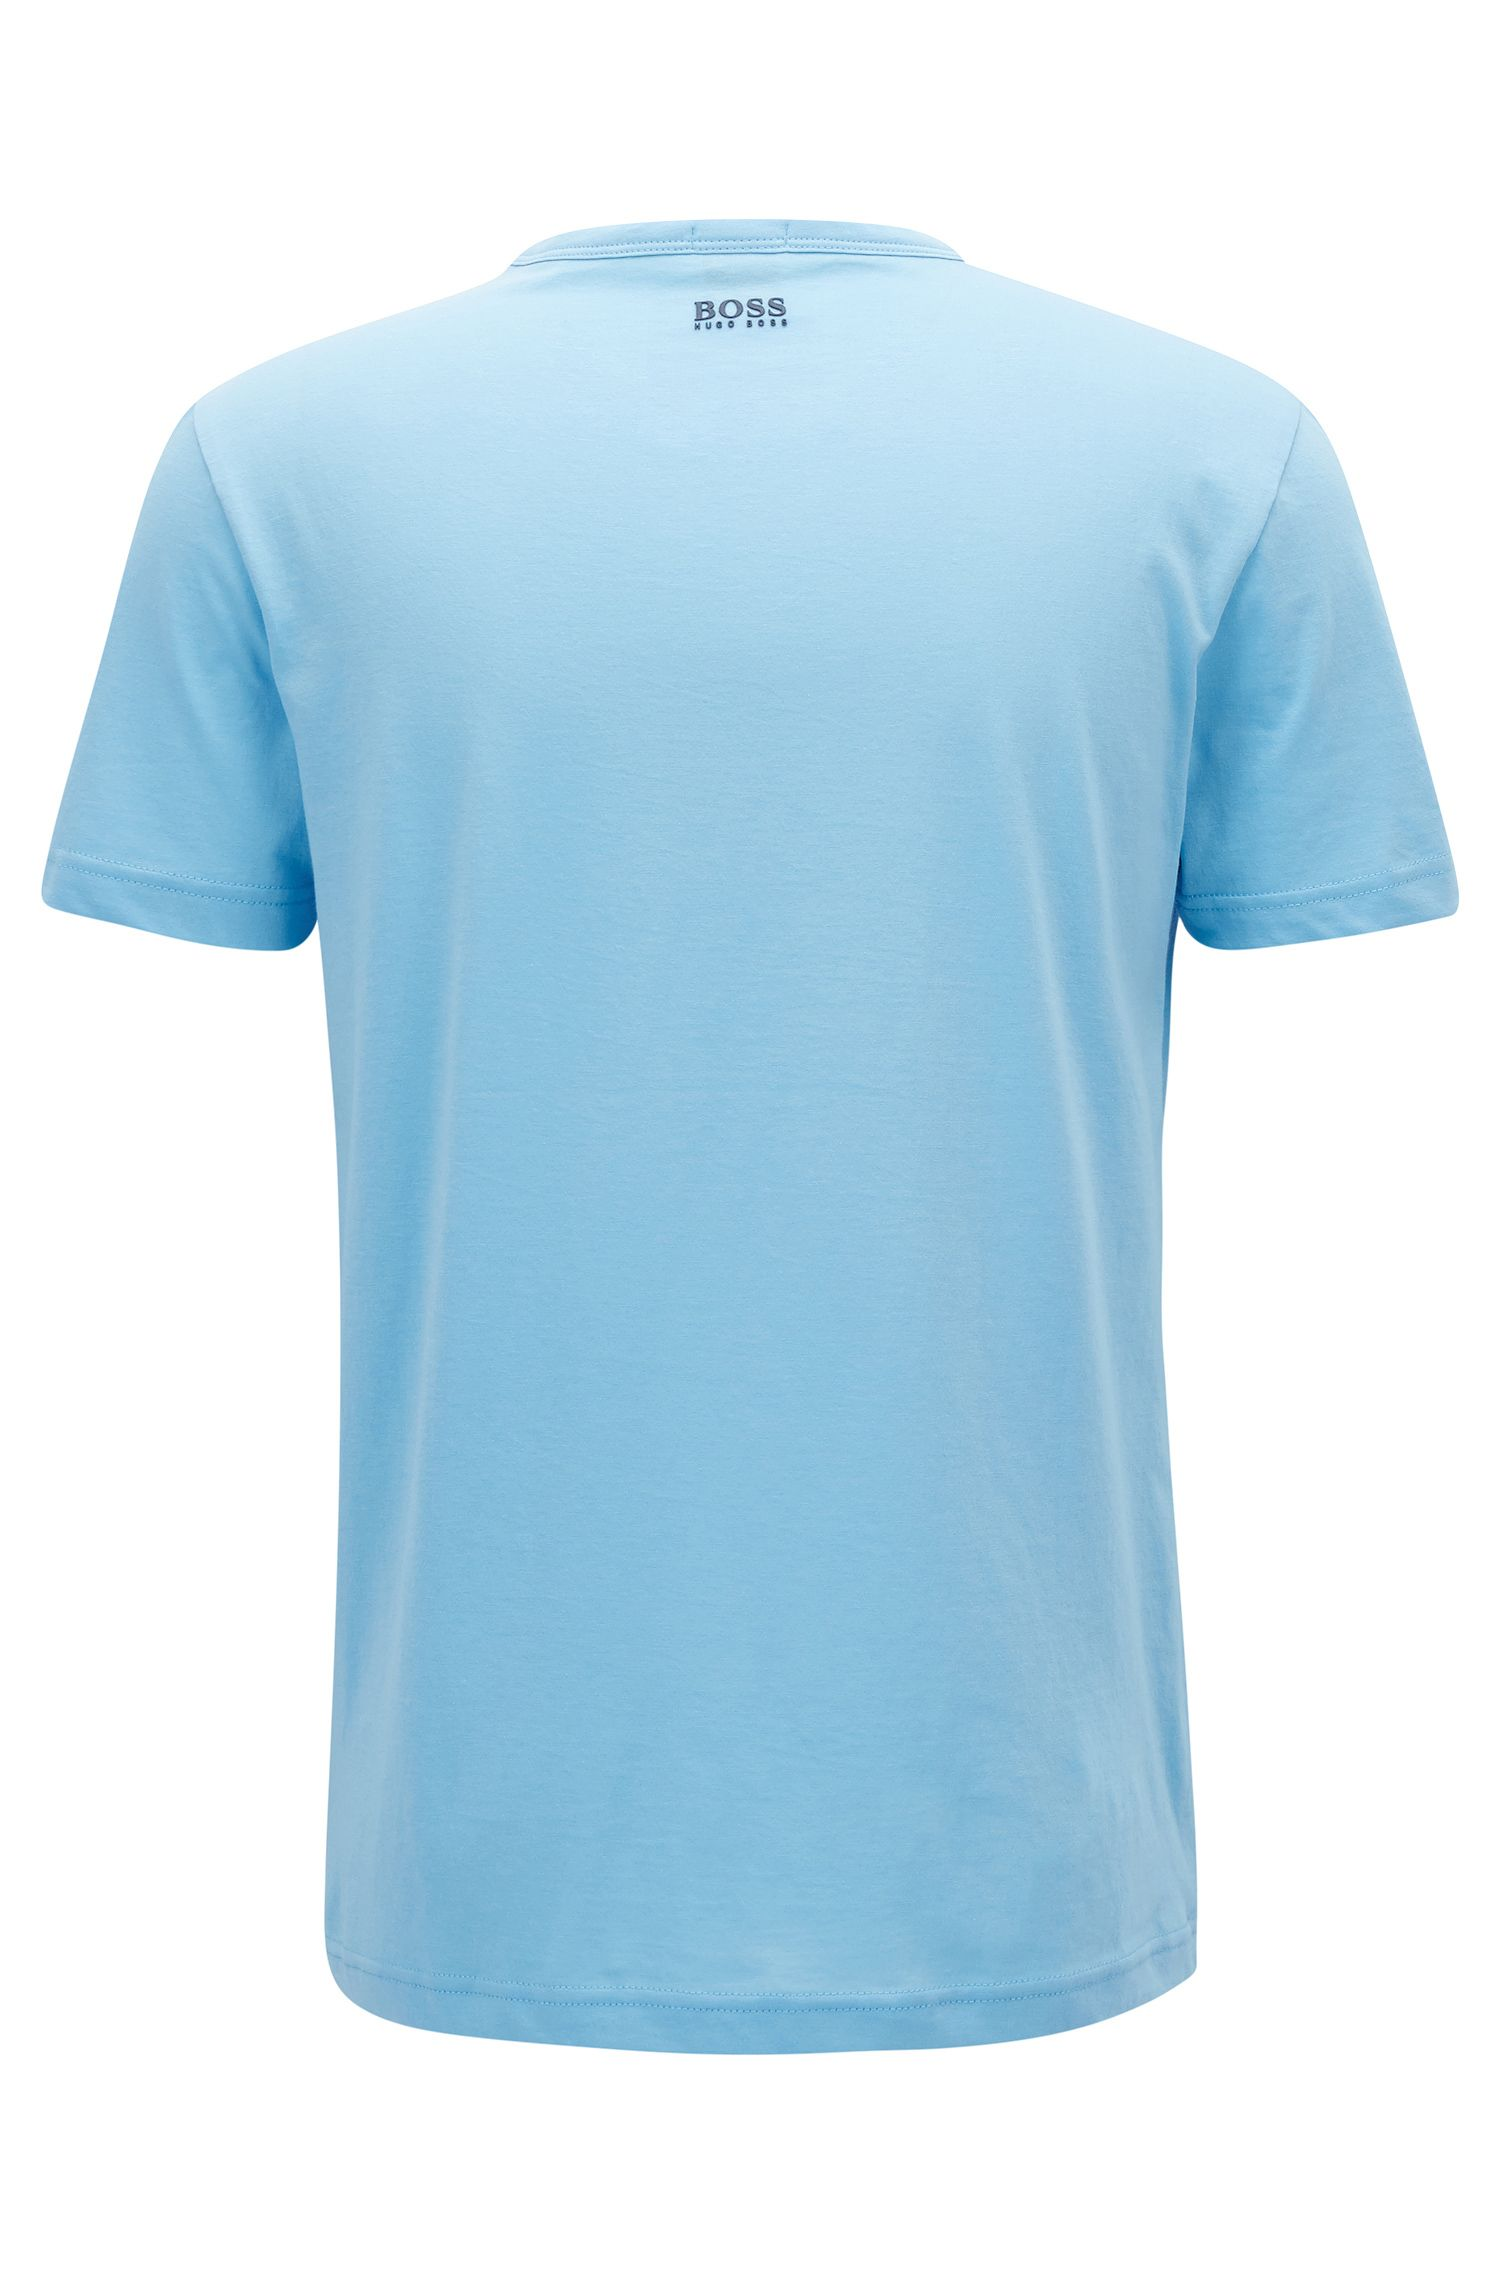 3D-logo T-shirt in soft cotton